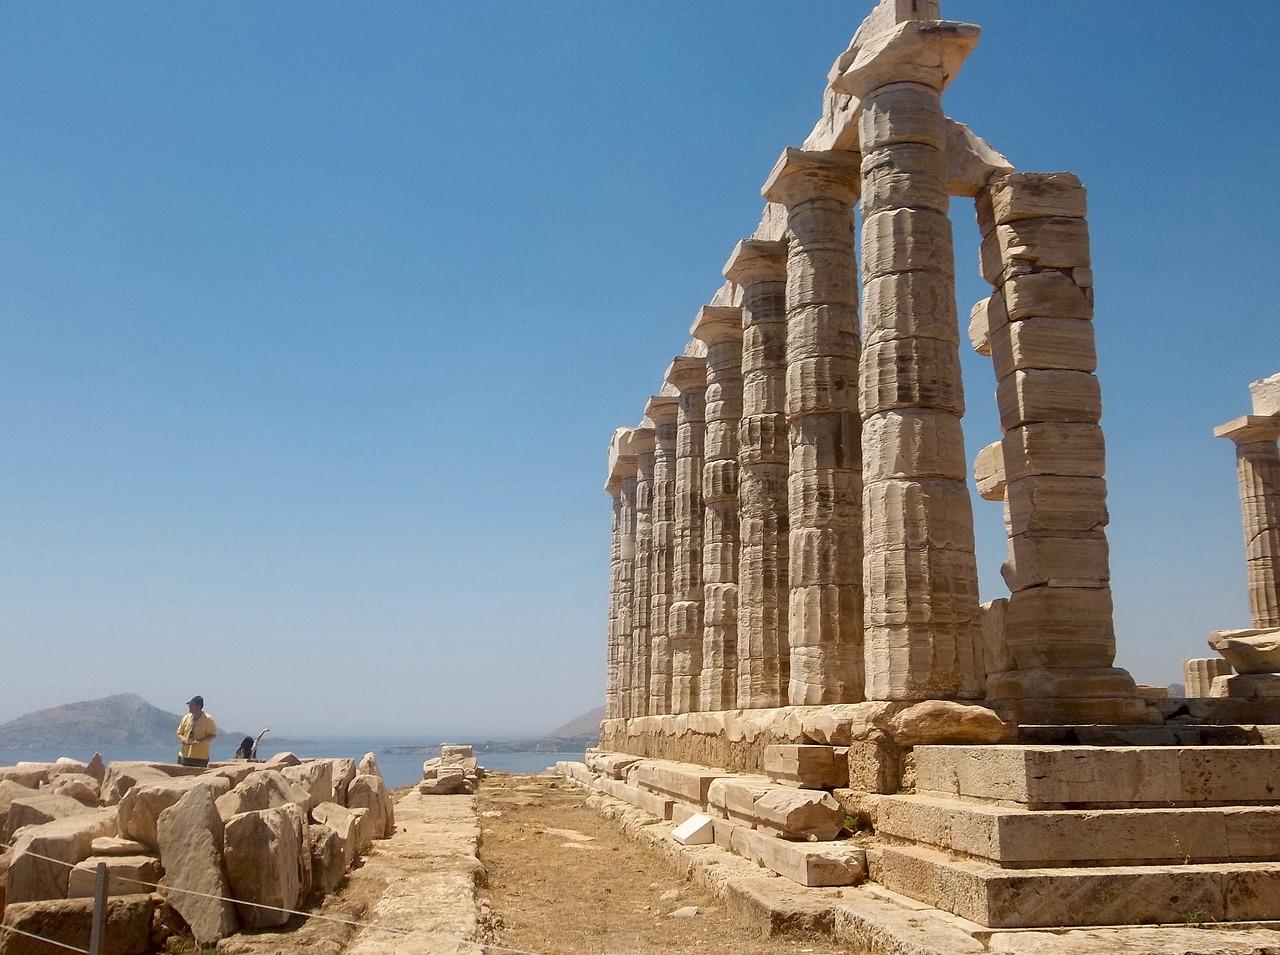 Temple of Poseidon near Athens